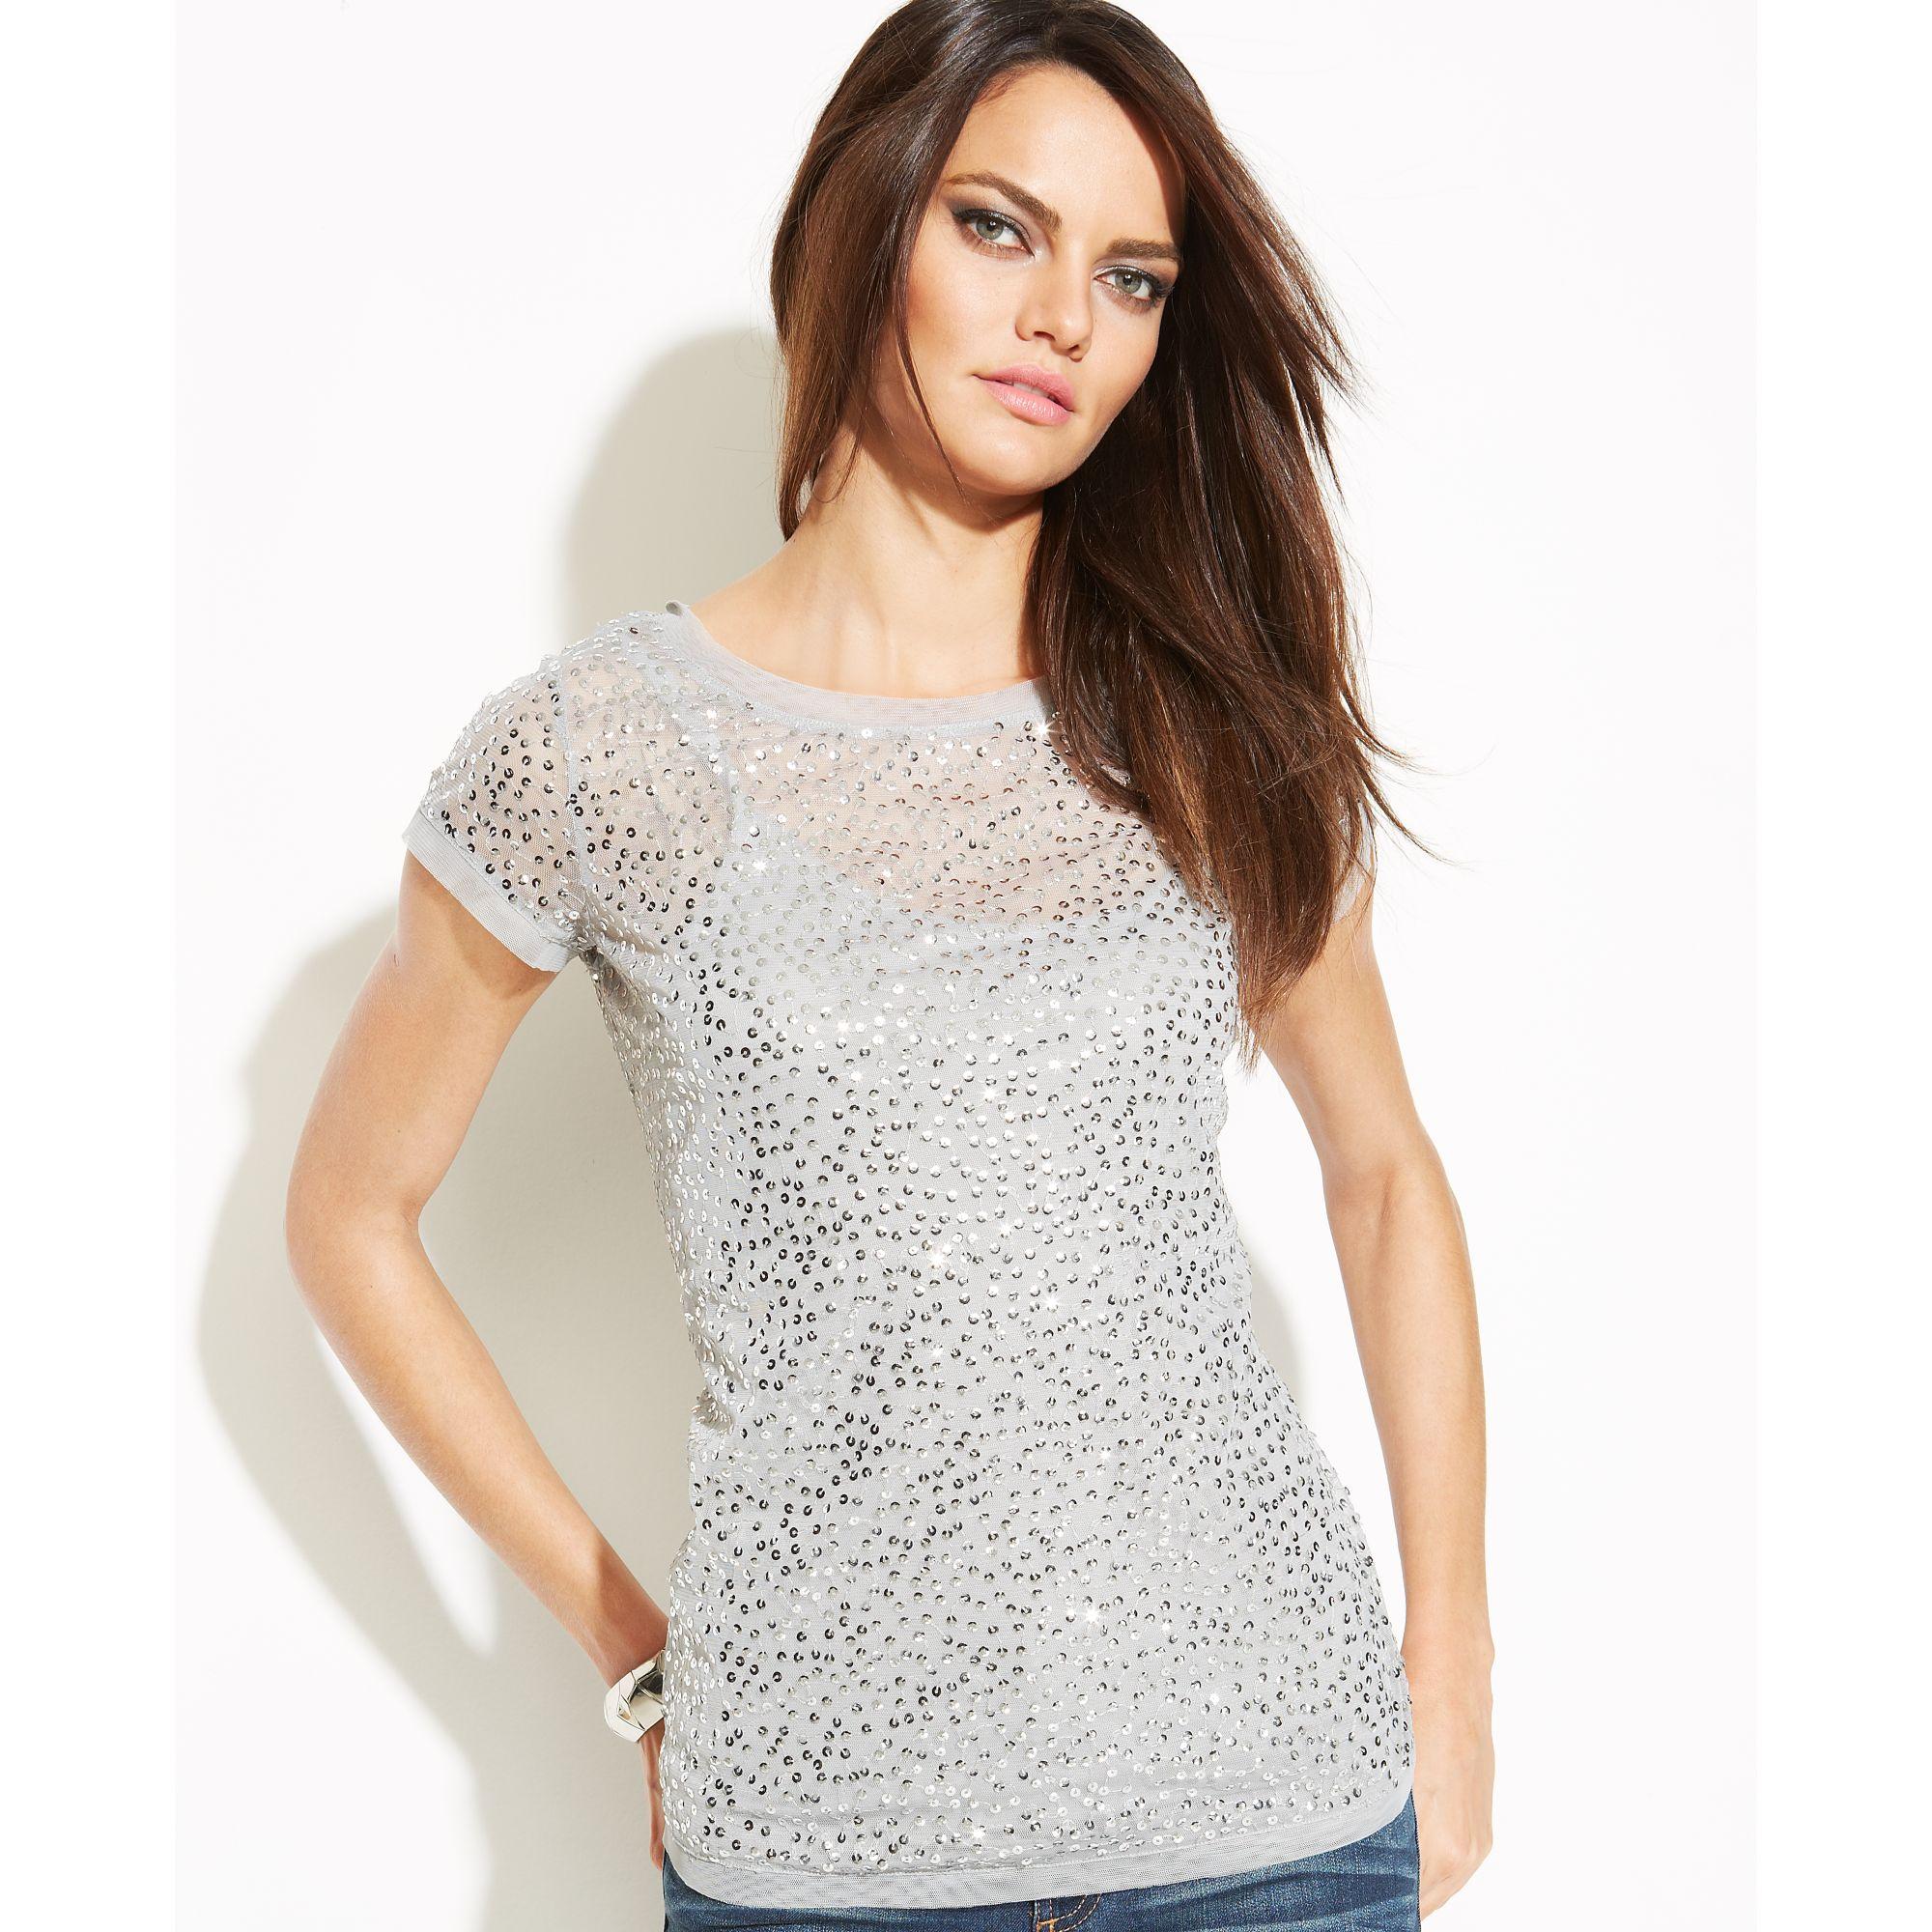 ff054d55409da Macys Inc Womens Shirts - BCD Tofu House